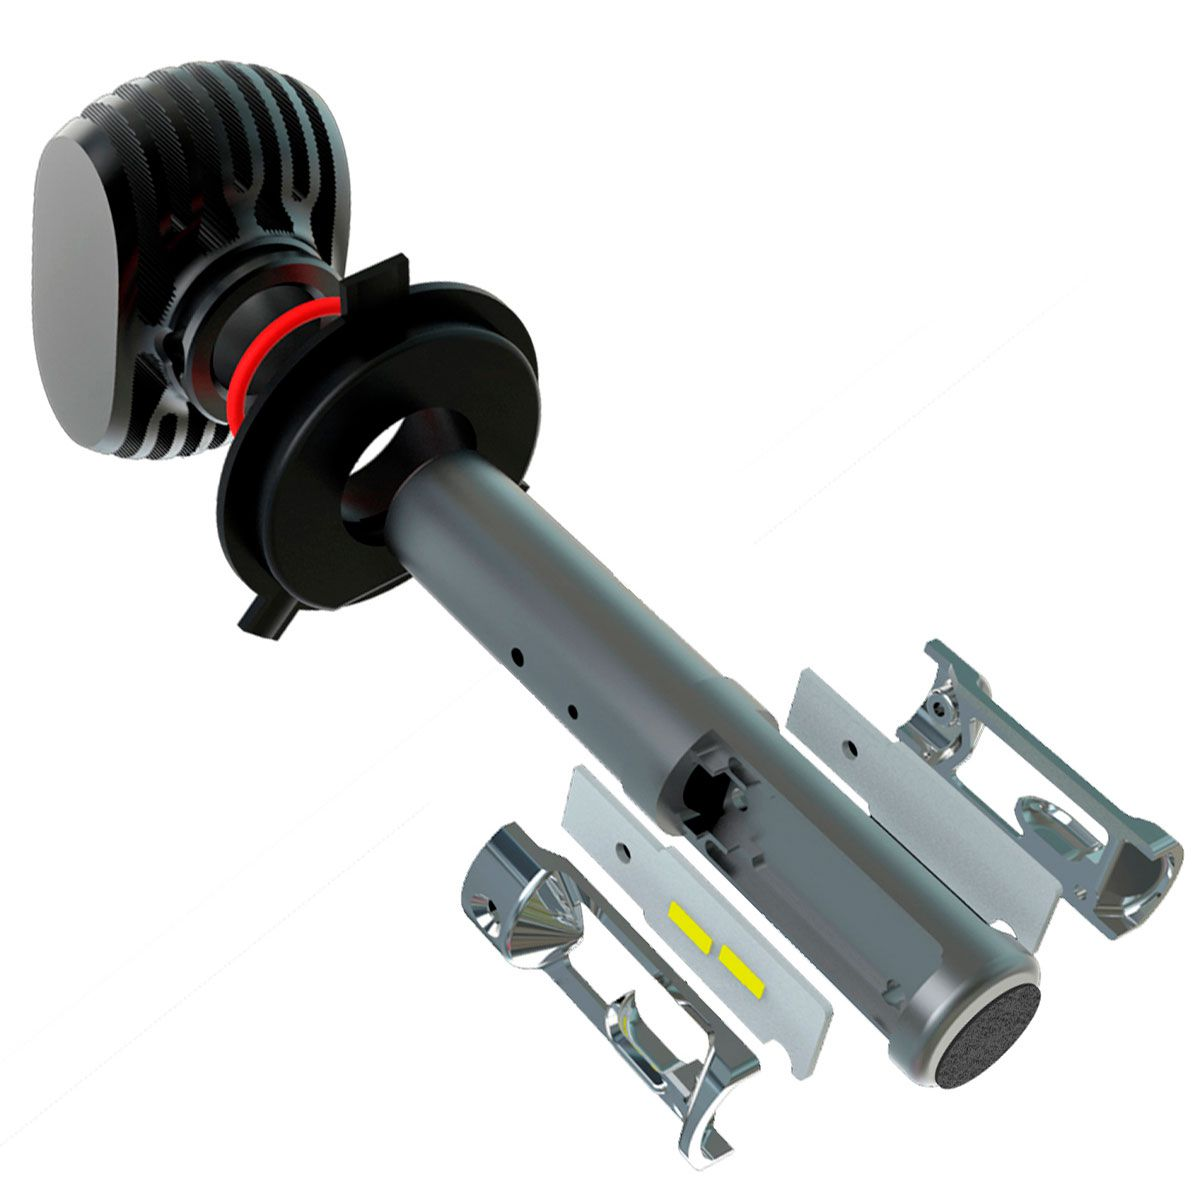 Kit Ultra LED Corolla 2003 2004 2005 2006 2007 tipo xenon farol baixo HB4 50W